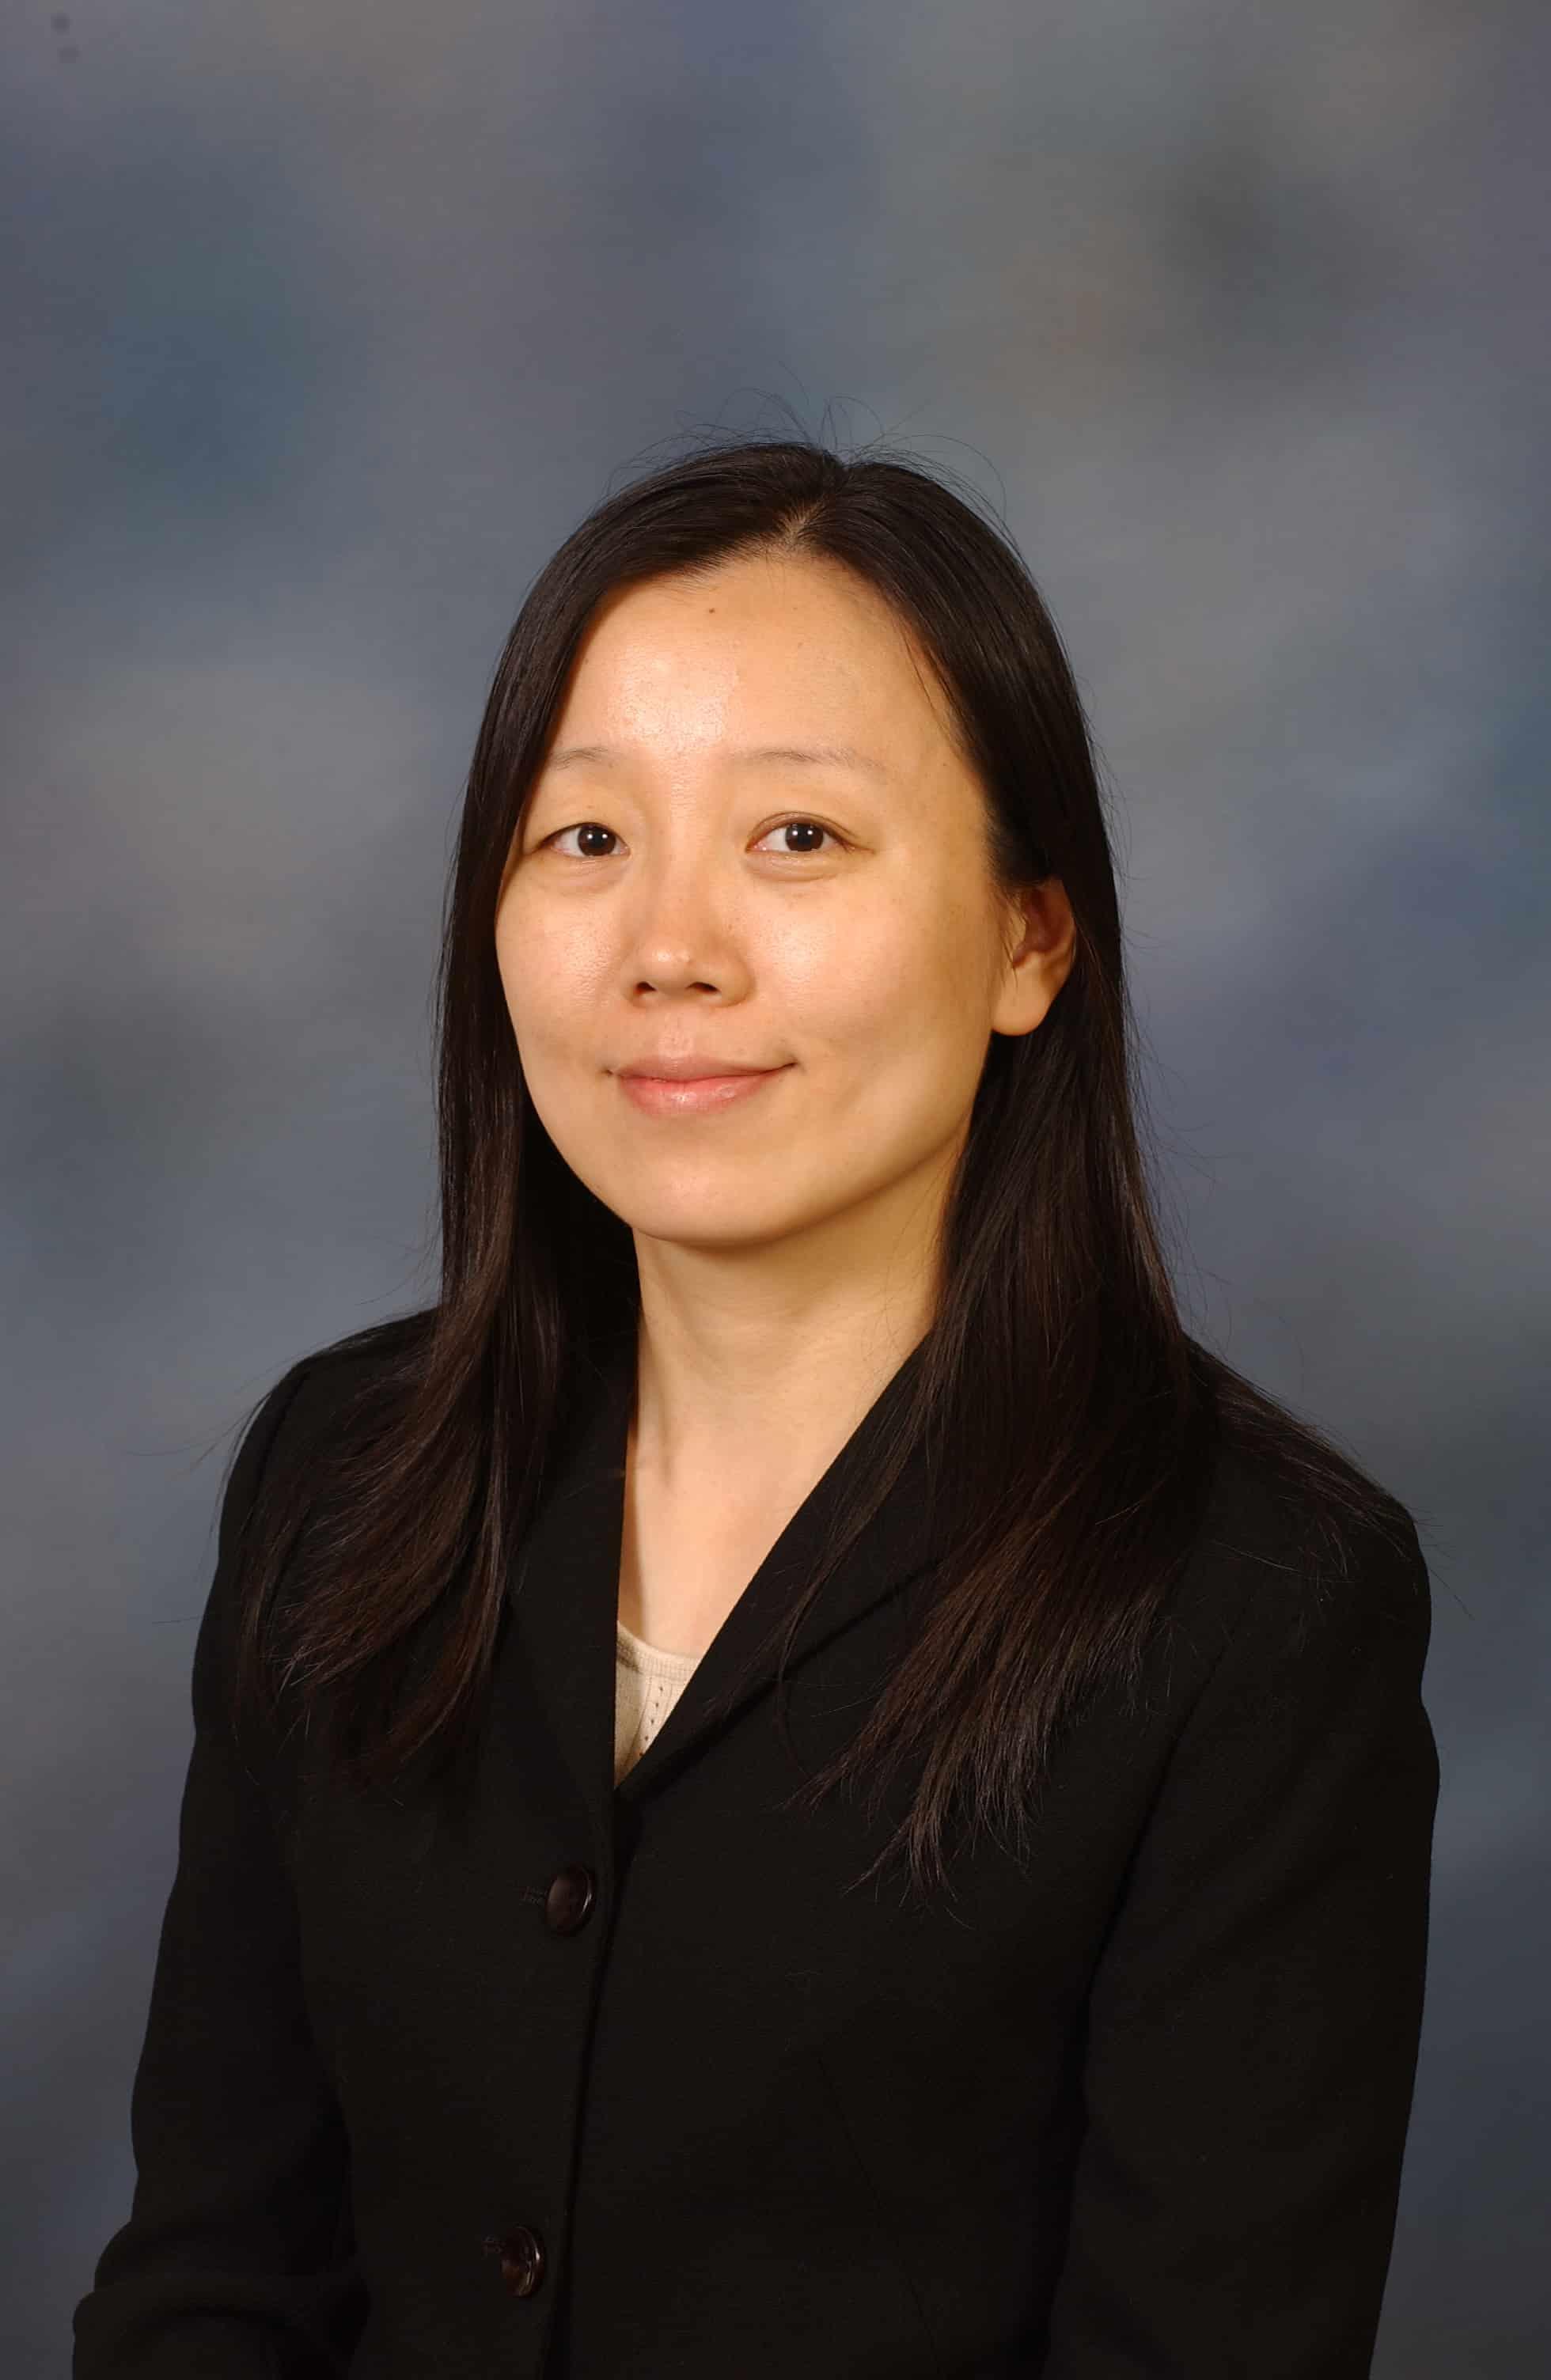 Chenghui Li, Ph.D.